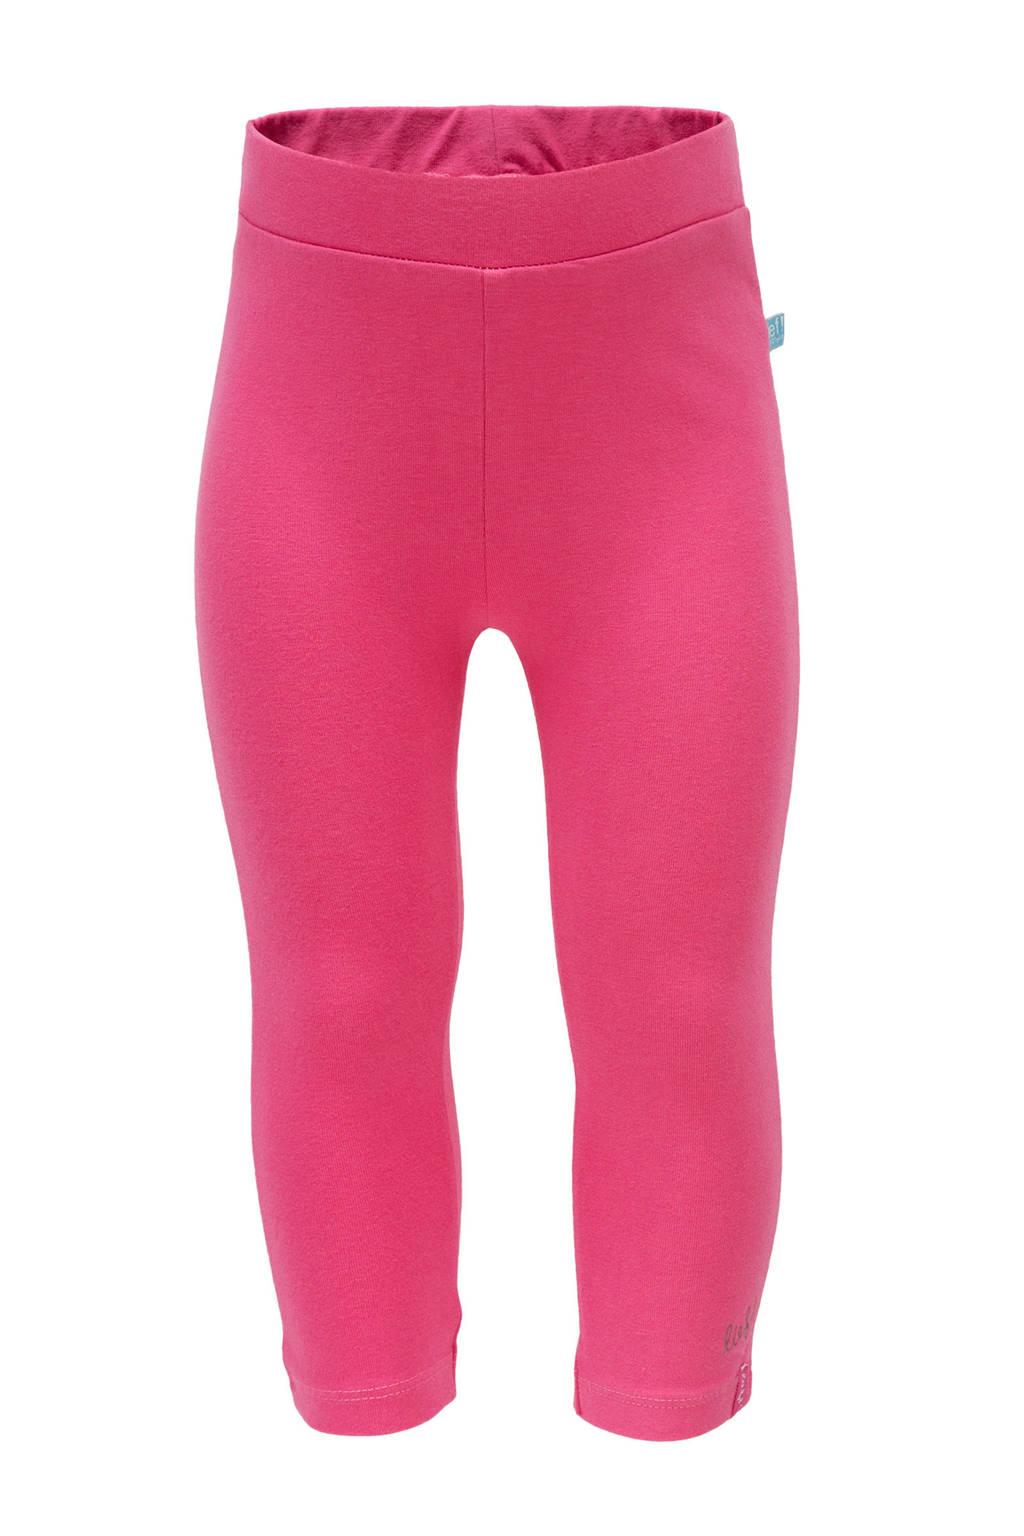 lief! legging roze, Roze